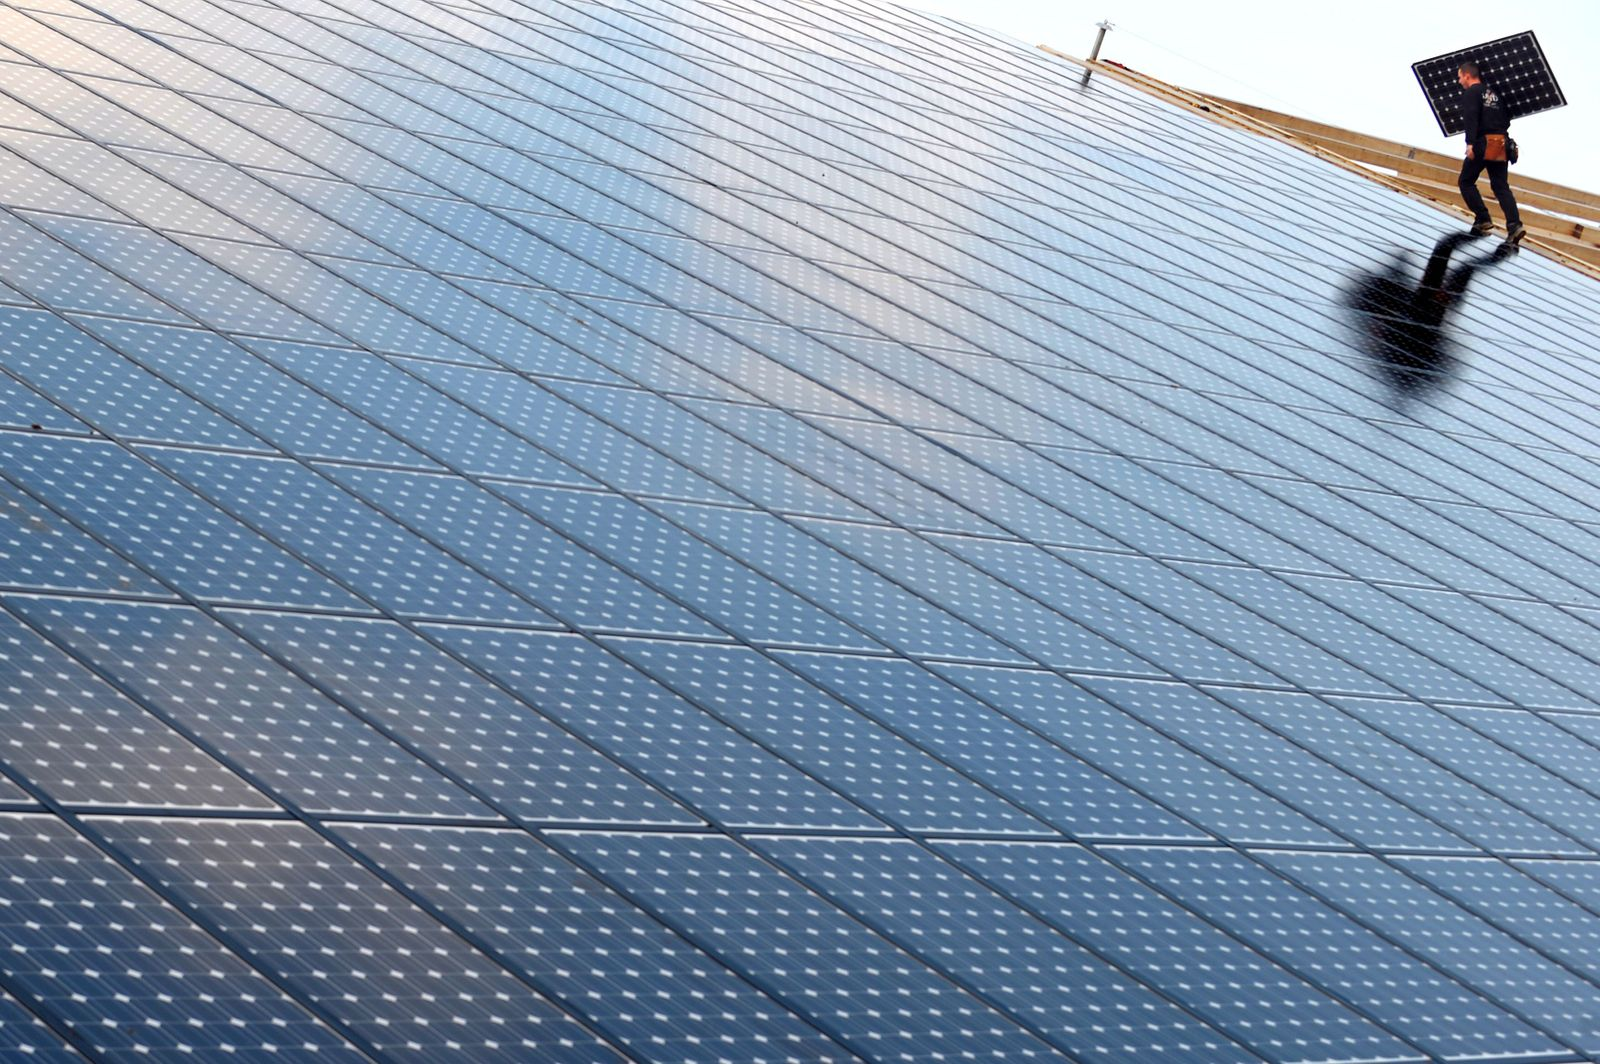 UN-CLIMATE-FRANCE-ENERGY-SOLAR PANEL